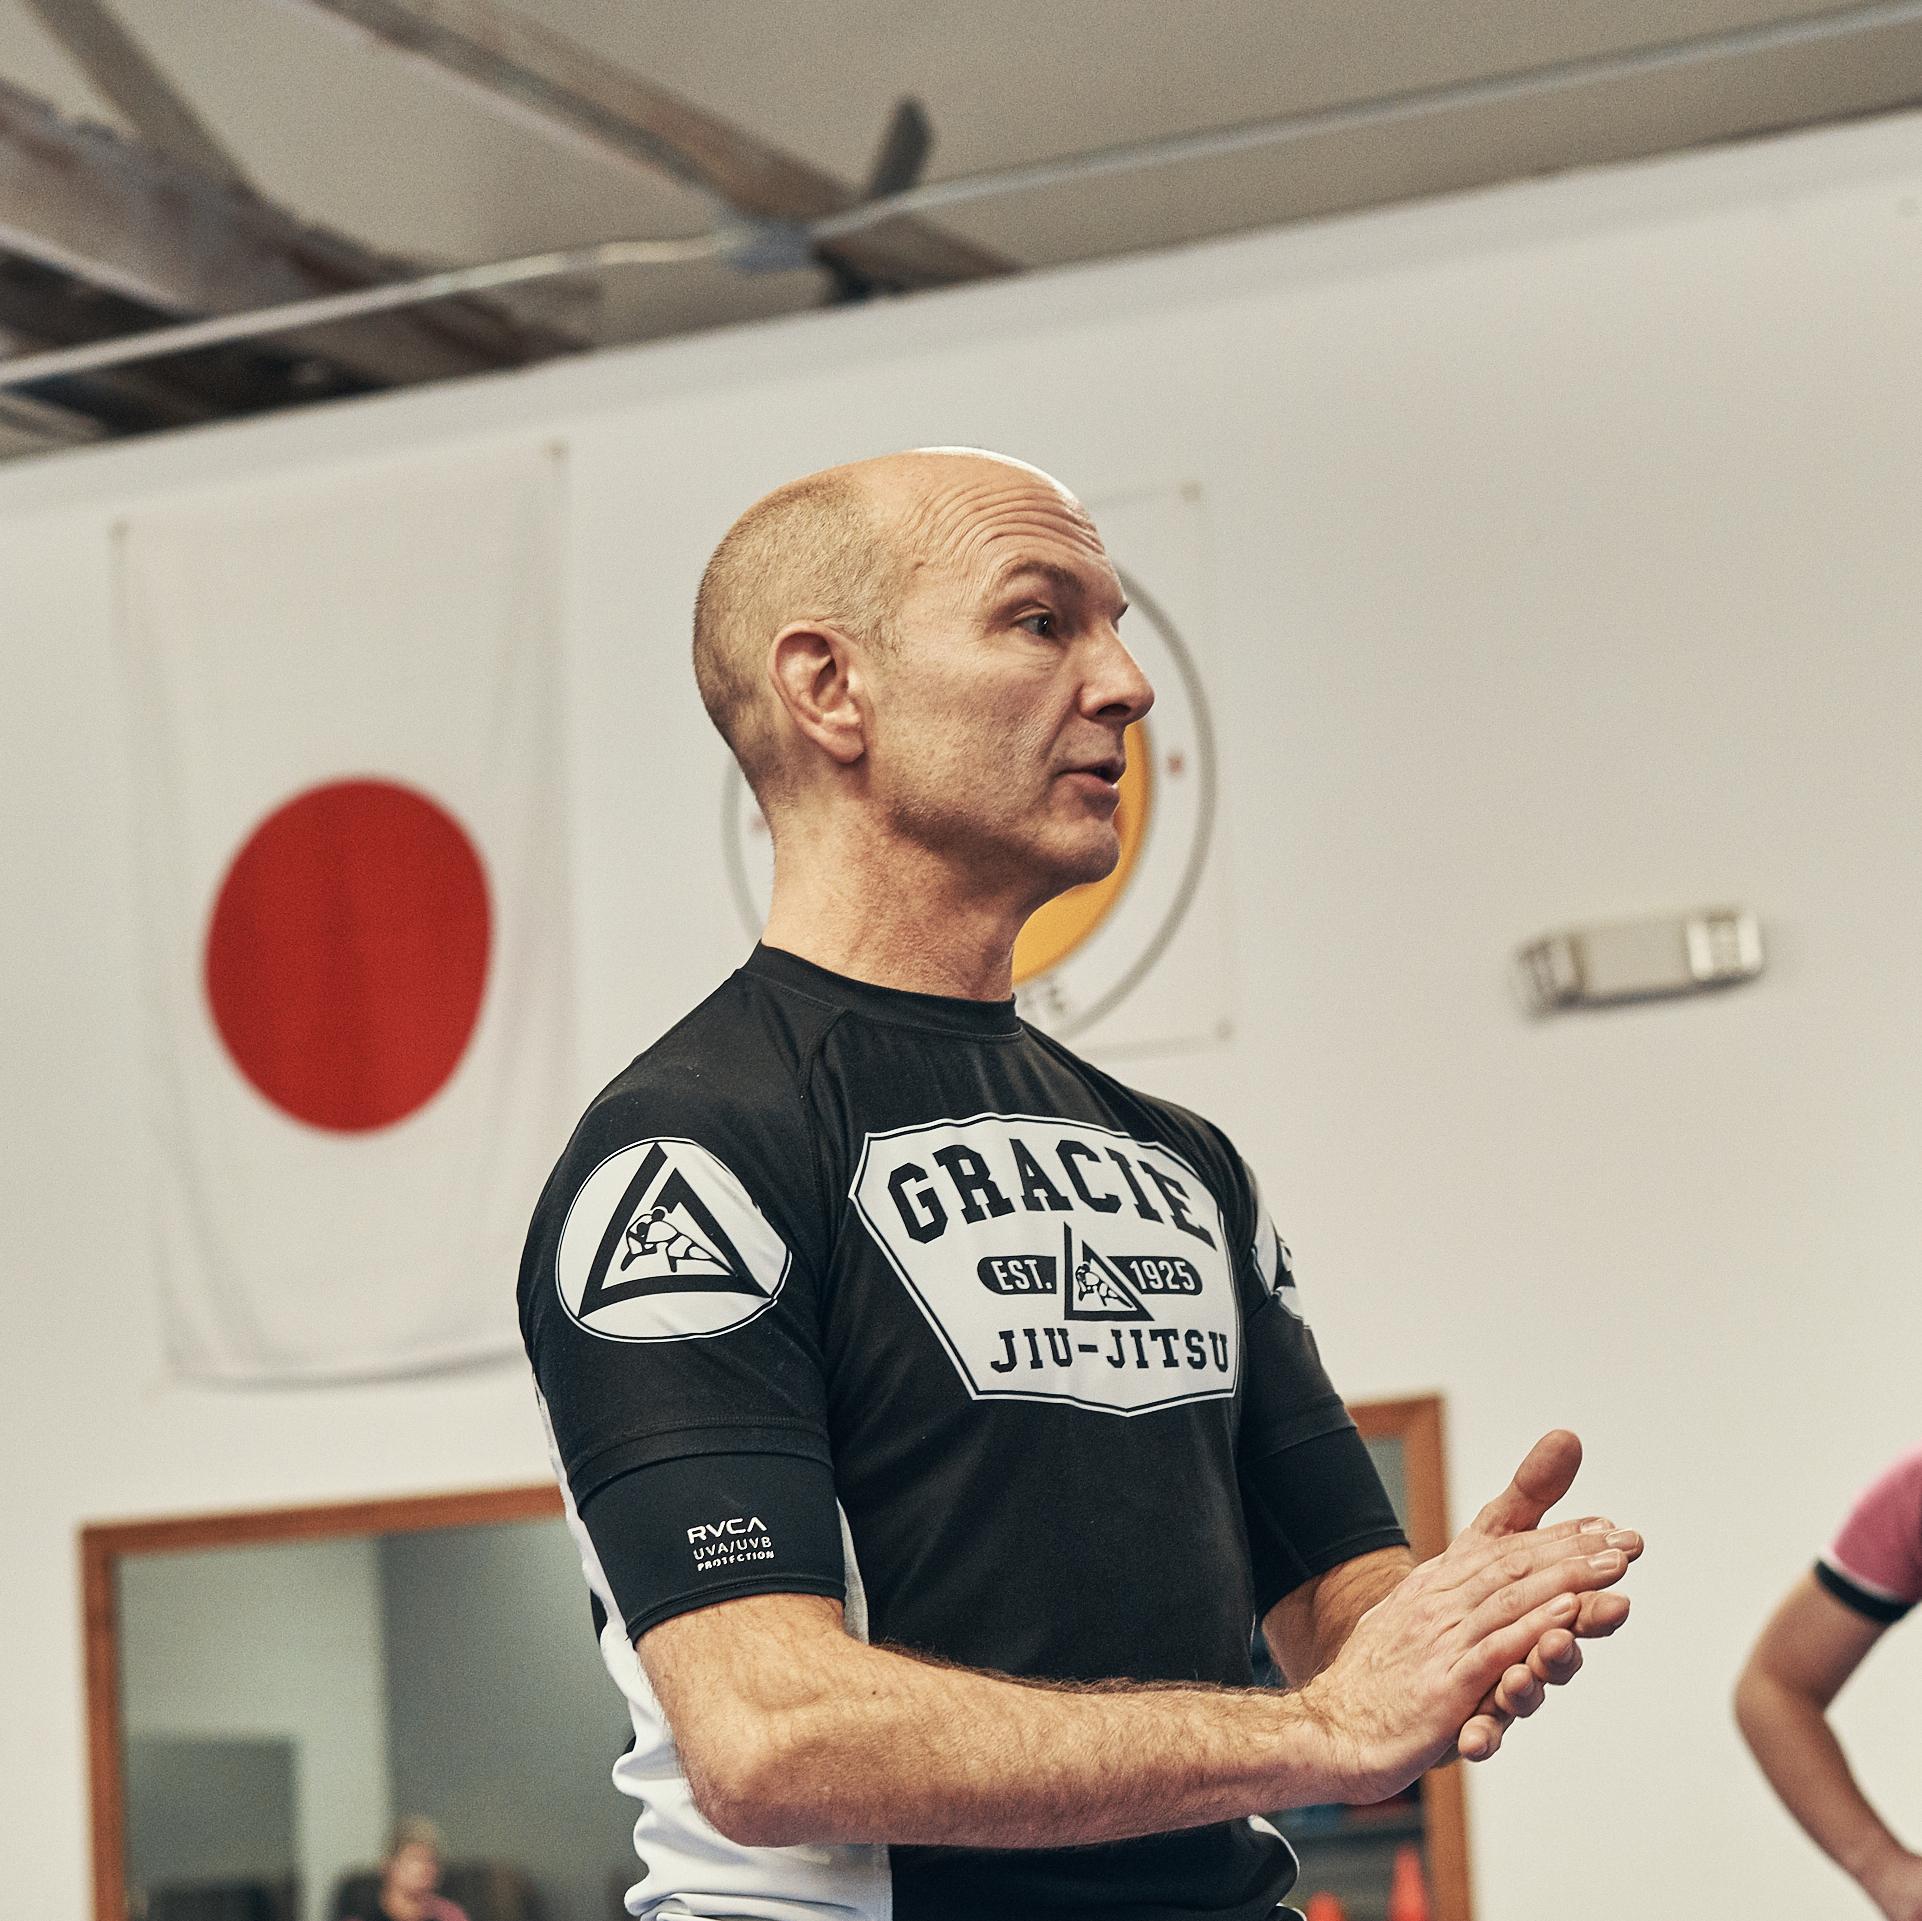 Victor Gracie jui-jitsu instructor and owner John Ingallina